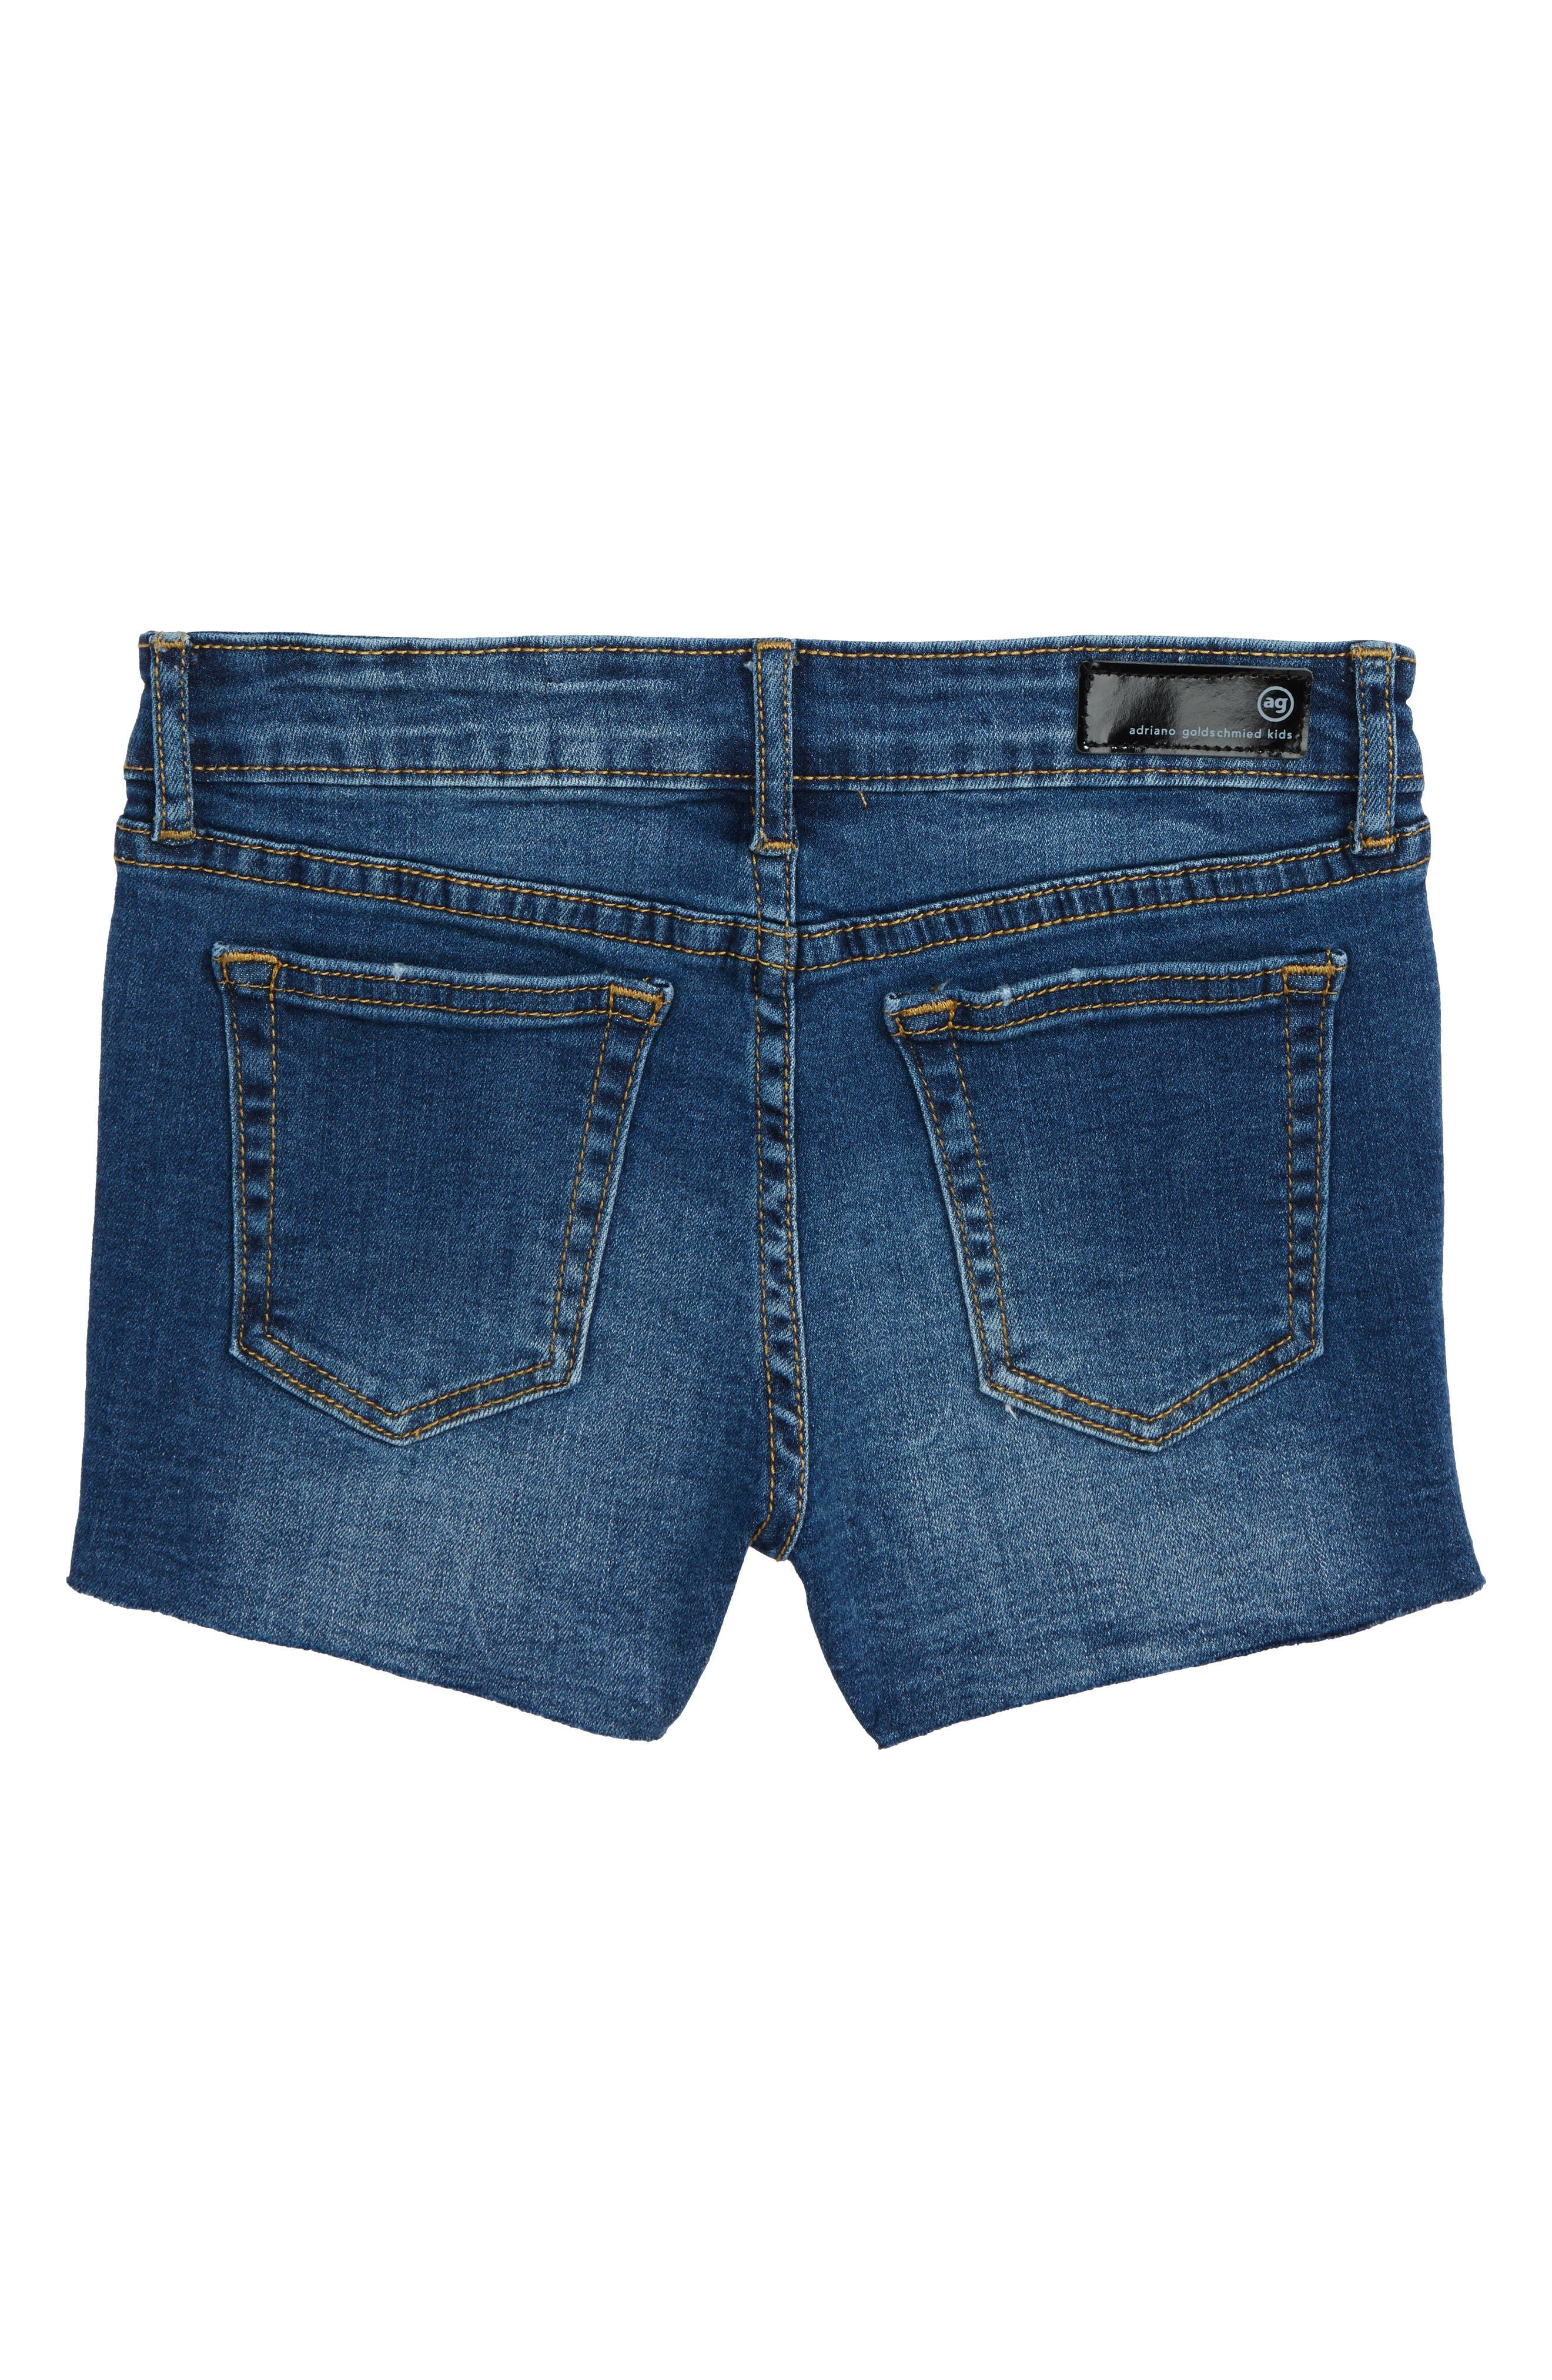 Alternate Image 2  - ag adriano goldschmied kids The Bruna Cutoff Denim Shorts (Big Girls)